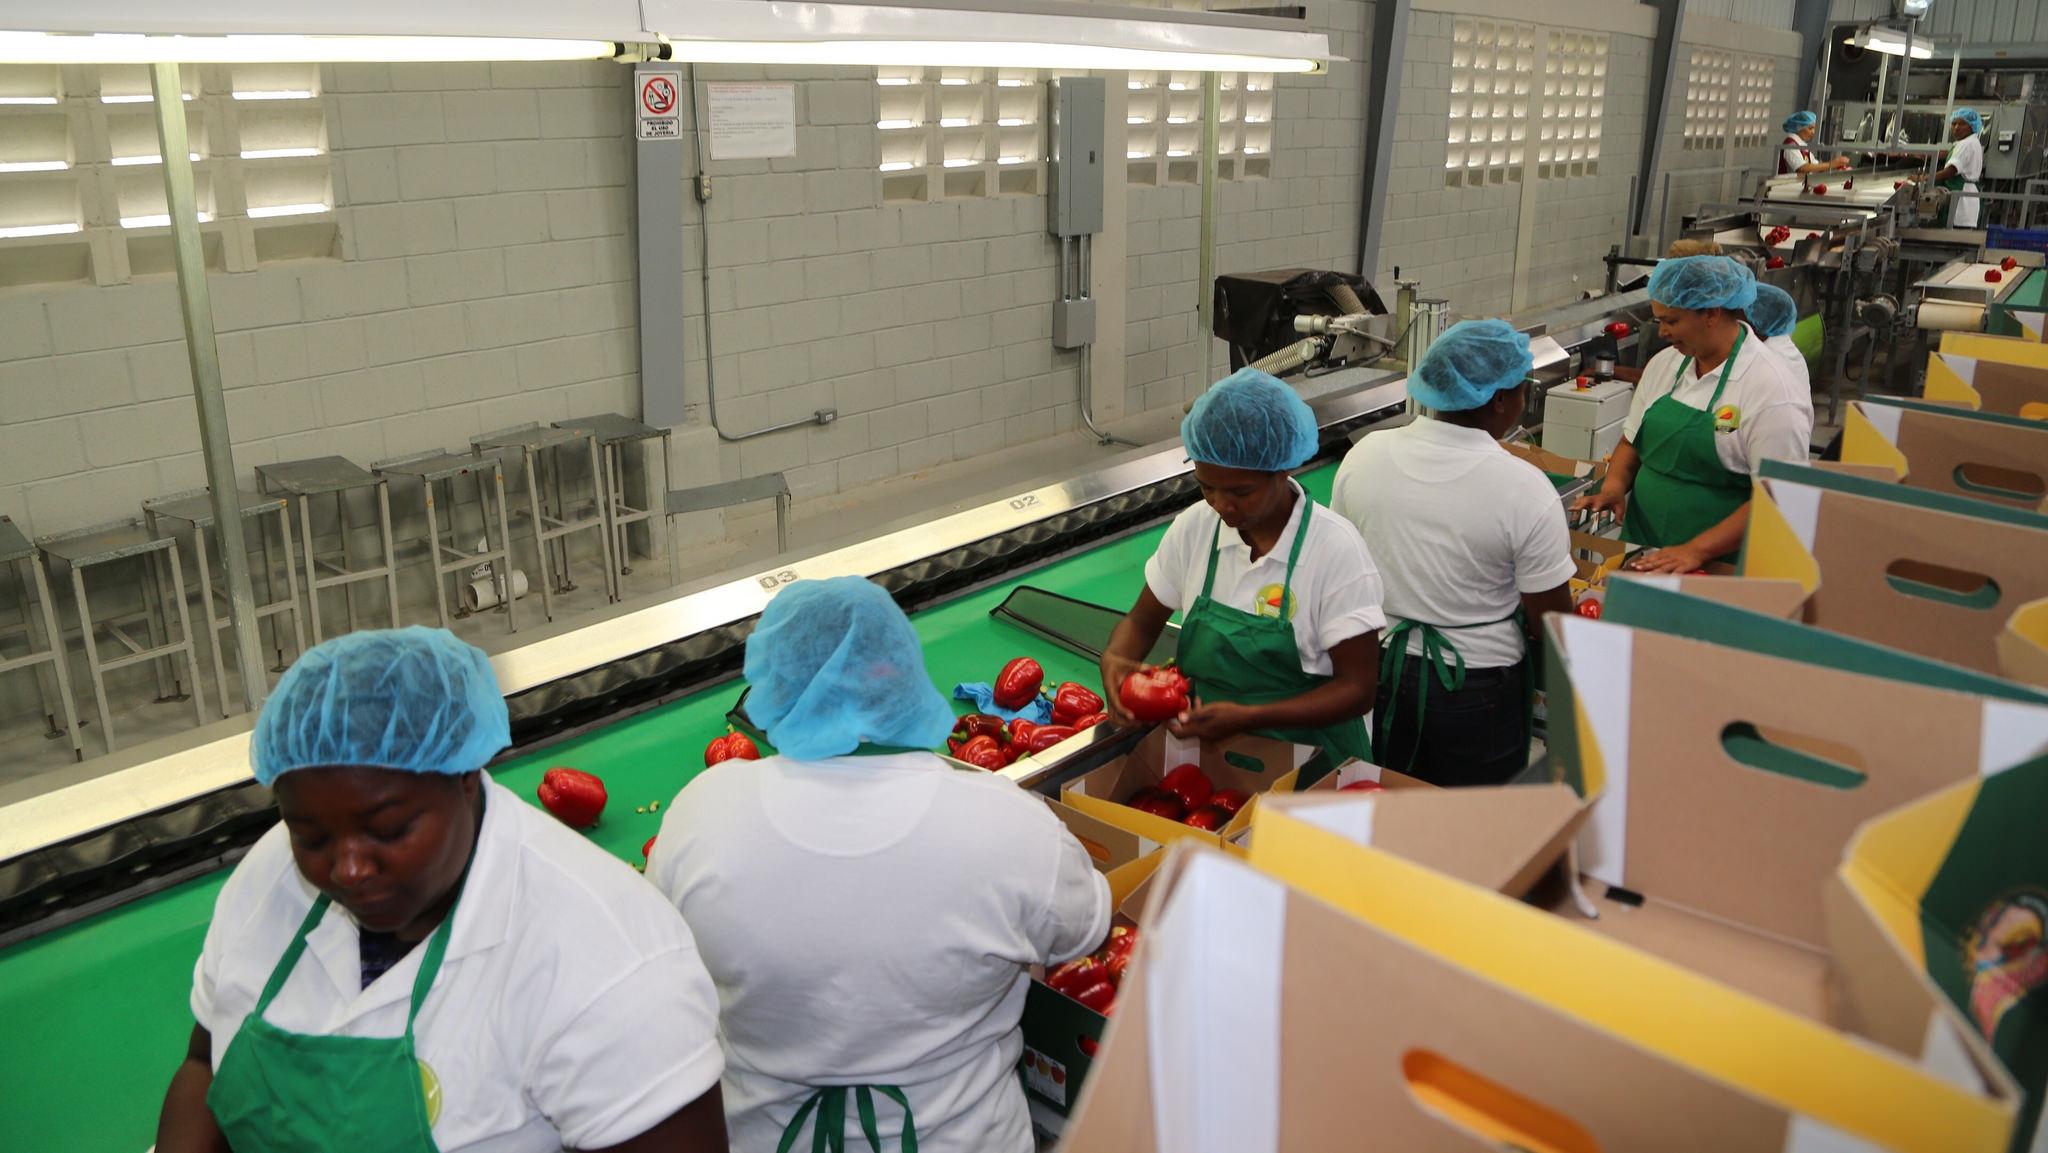 Medina visita empacadora en Ocoa; destaca empuje en producción vegetales